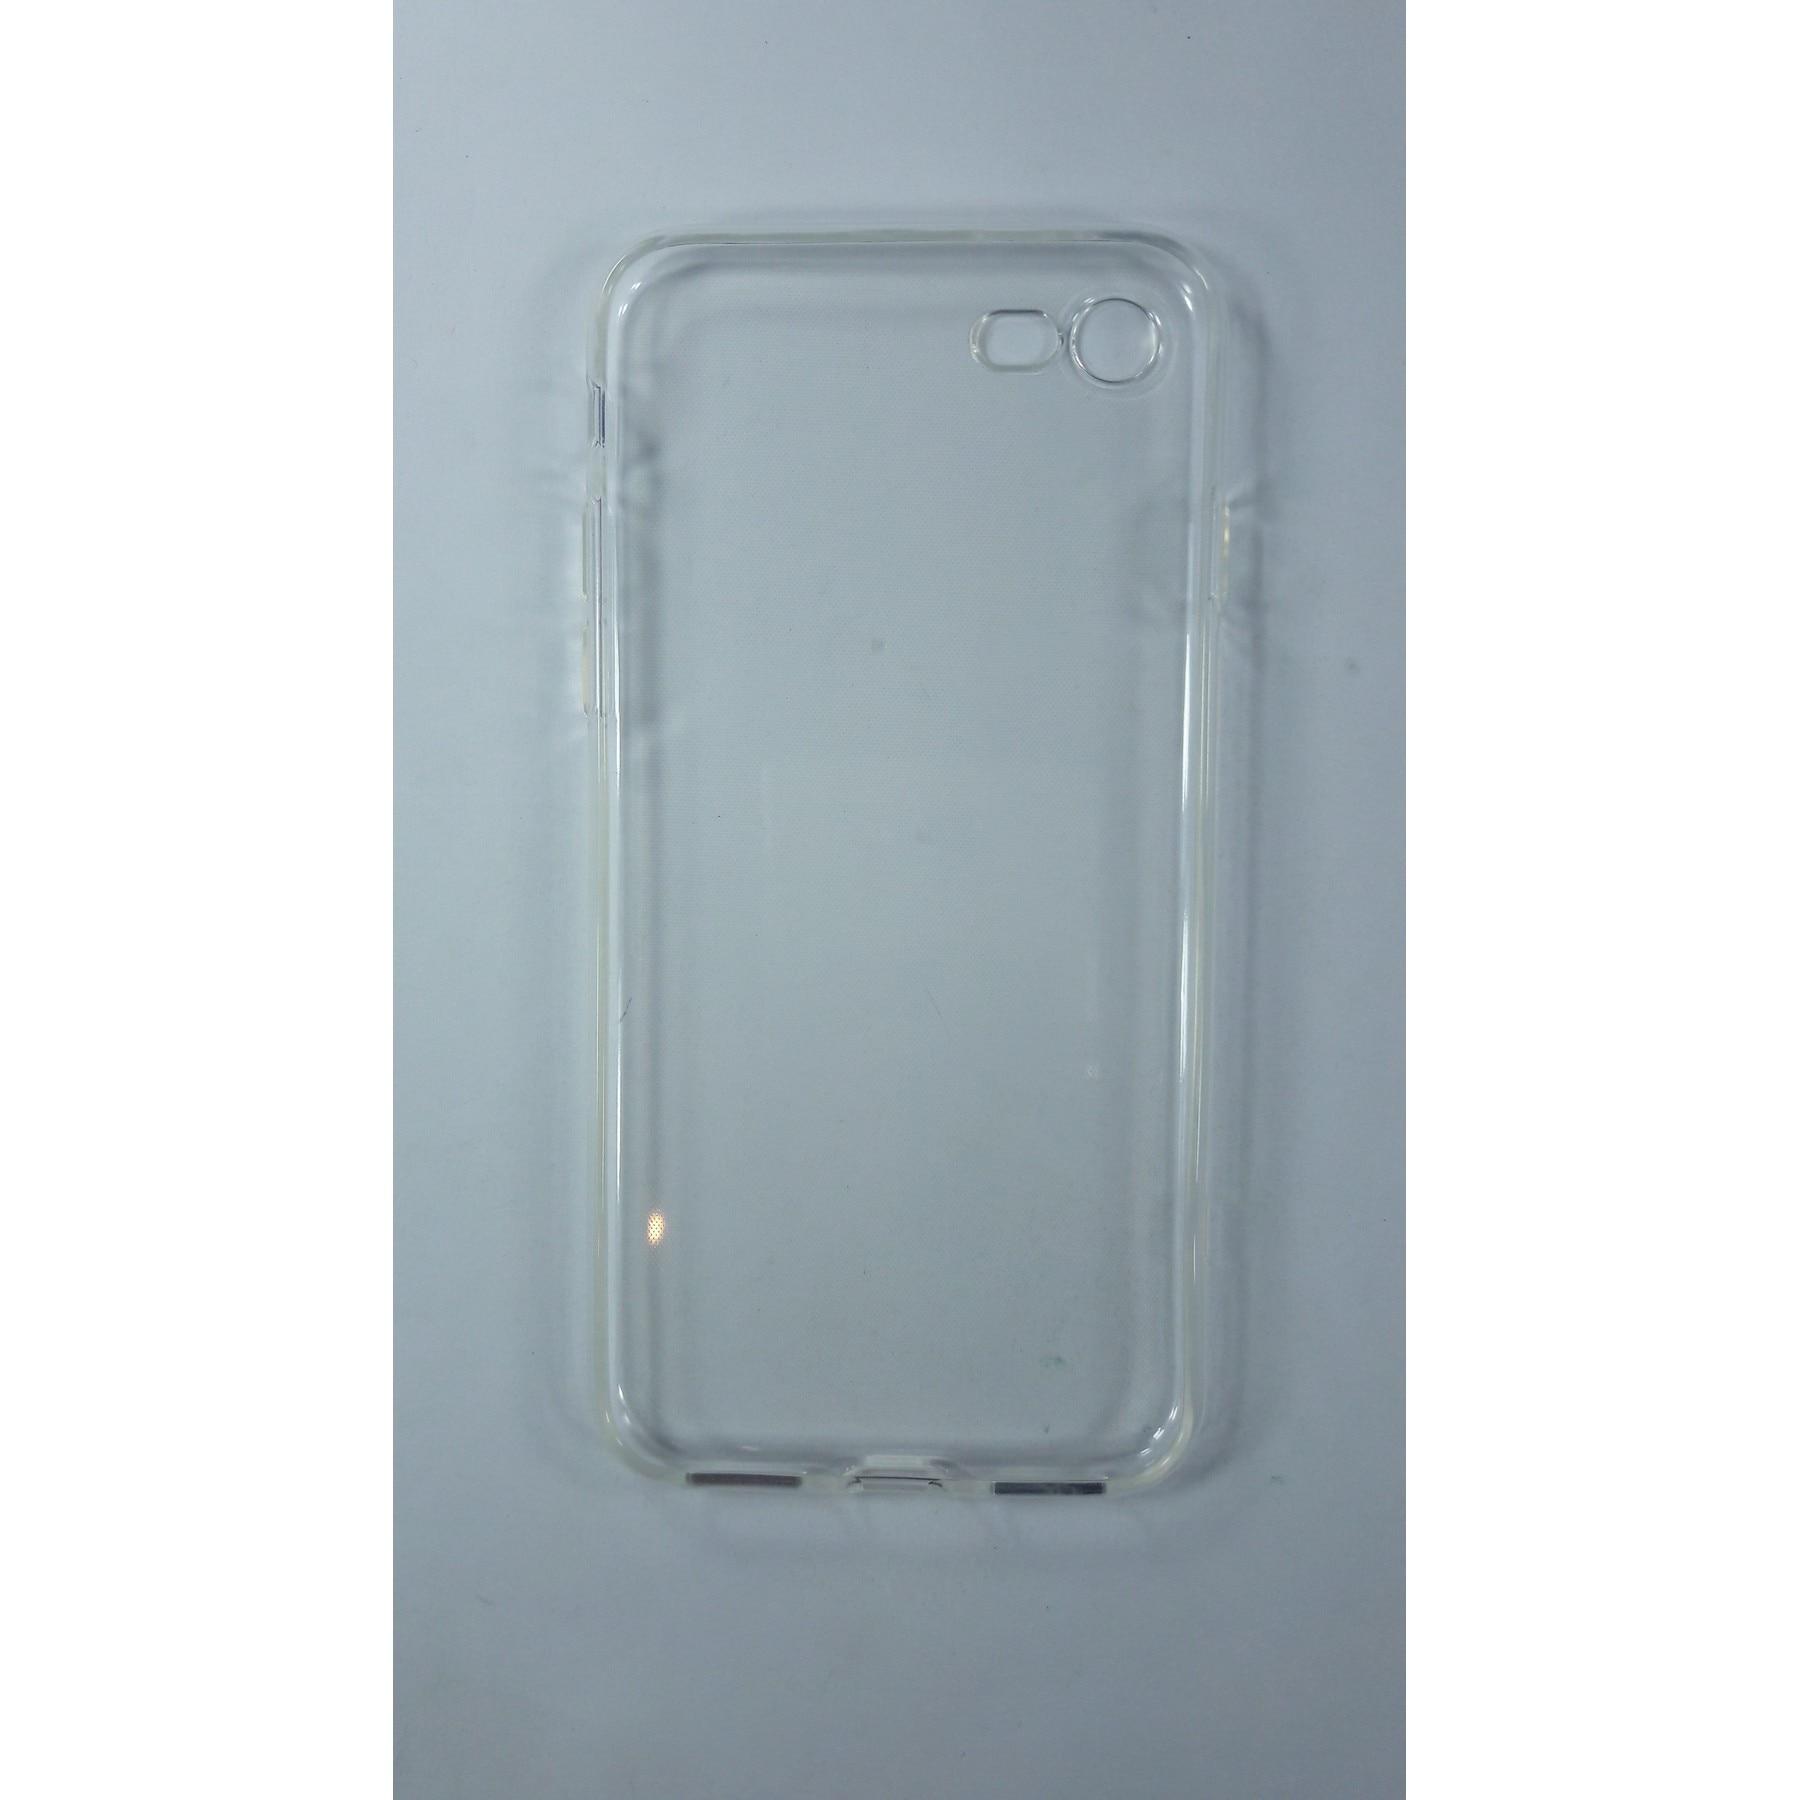 Funda de gel TPU carcasa protectora silicona para Apple Iphone 7 Transparente